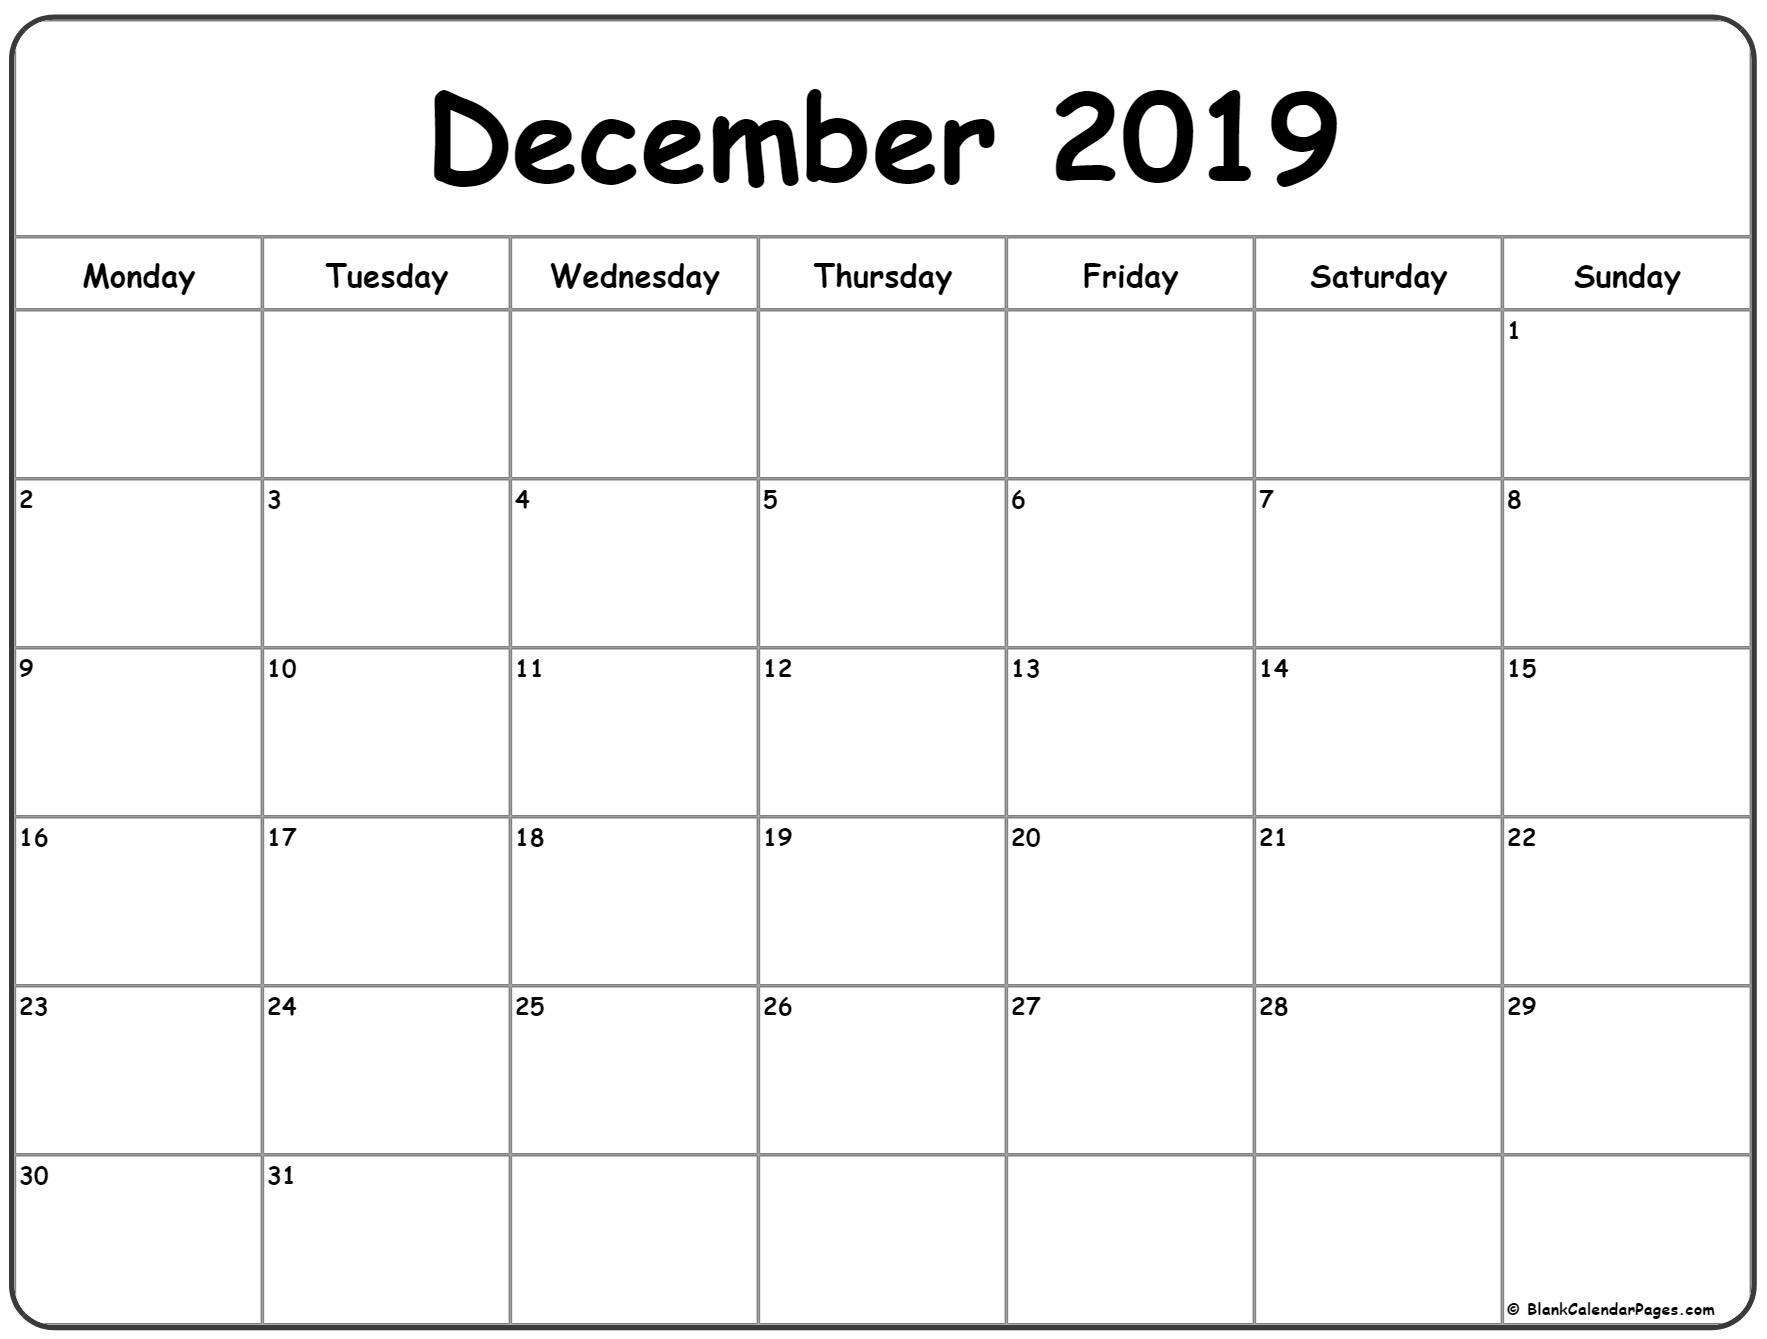 December 2019 Monday Calendar | Monday To Sunday in Calendar 2019 Monday To Sunday